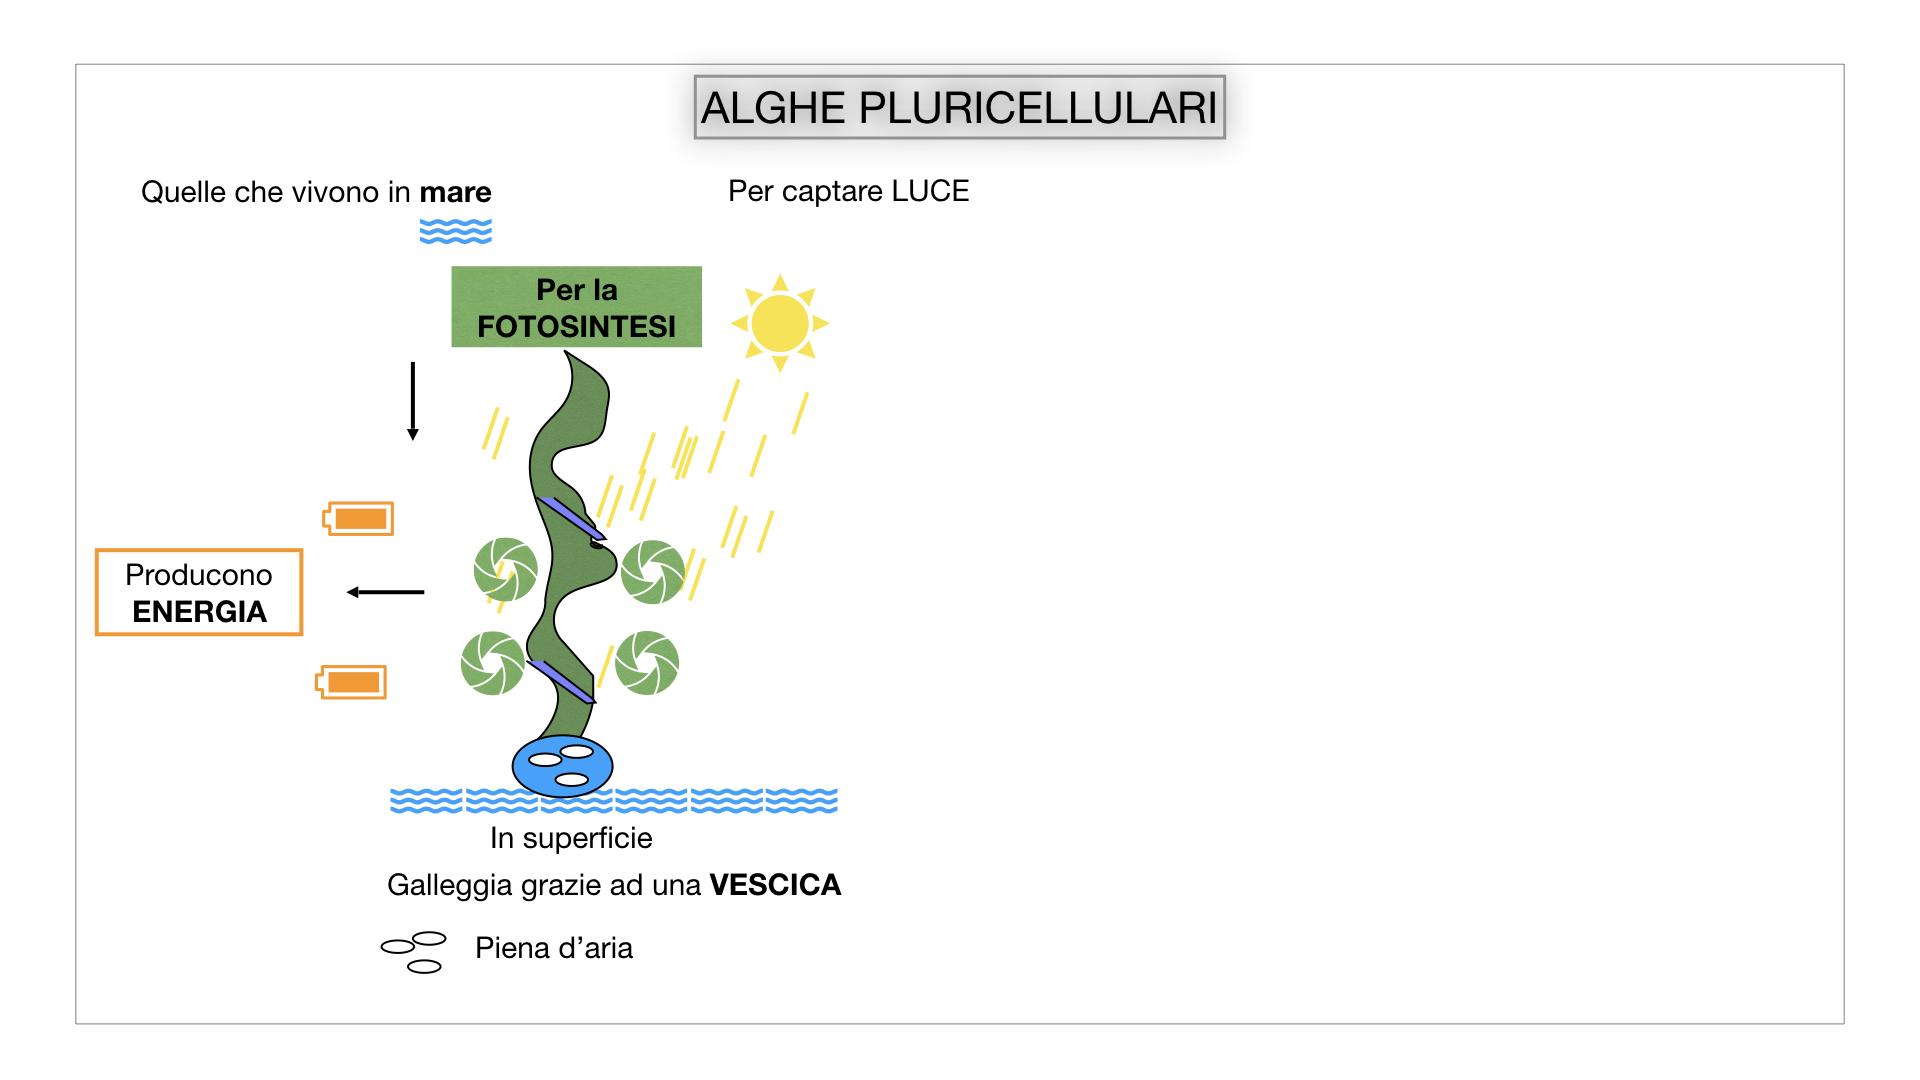 8. alghe uni_pluri_cellulari_SIMULAZIONE.037